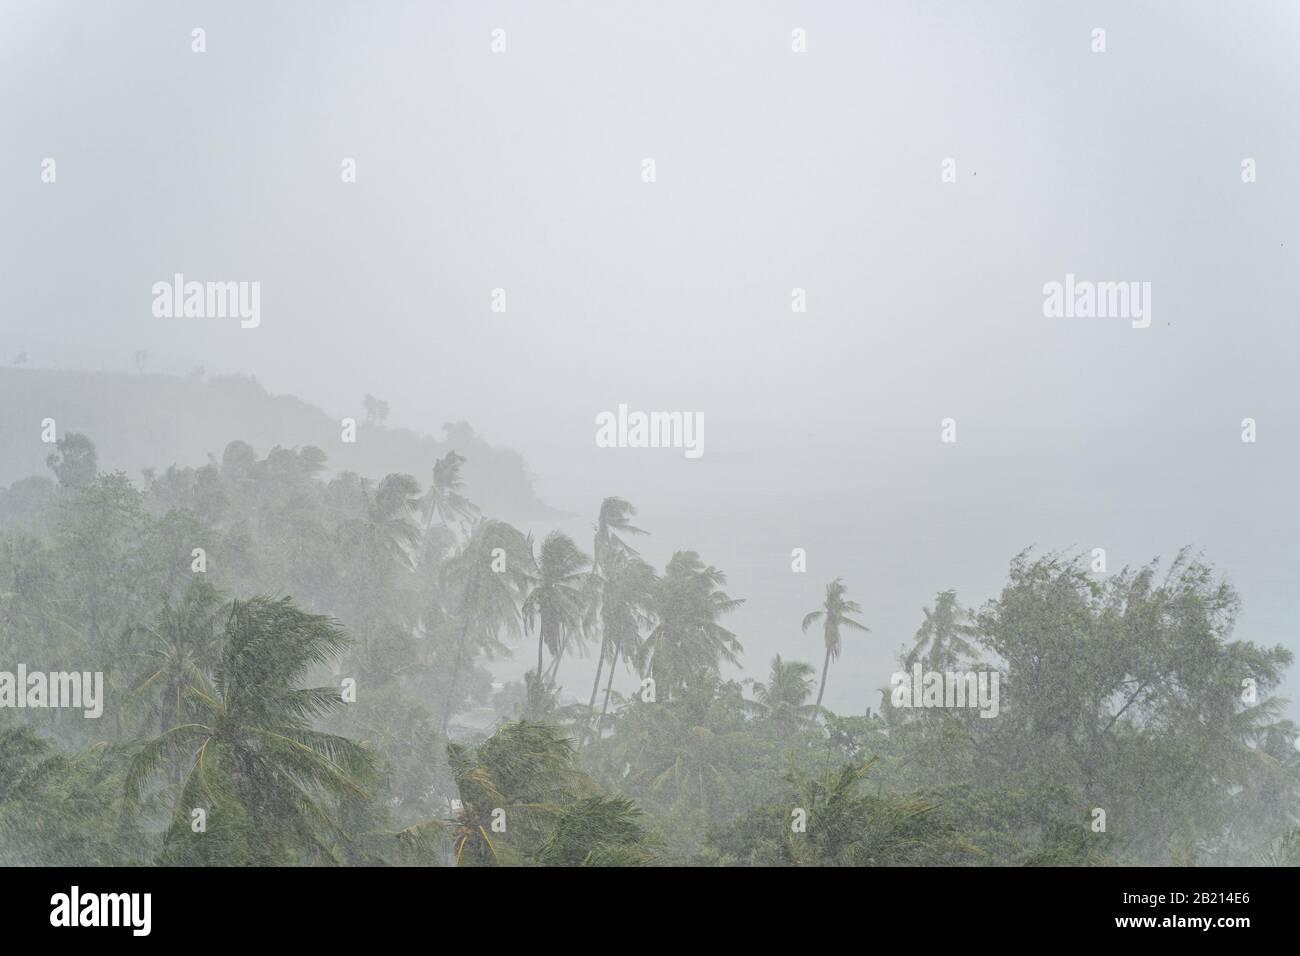 Unpredictable severe storm raging over a rainforest Stock Photo